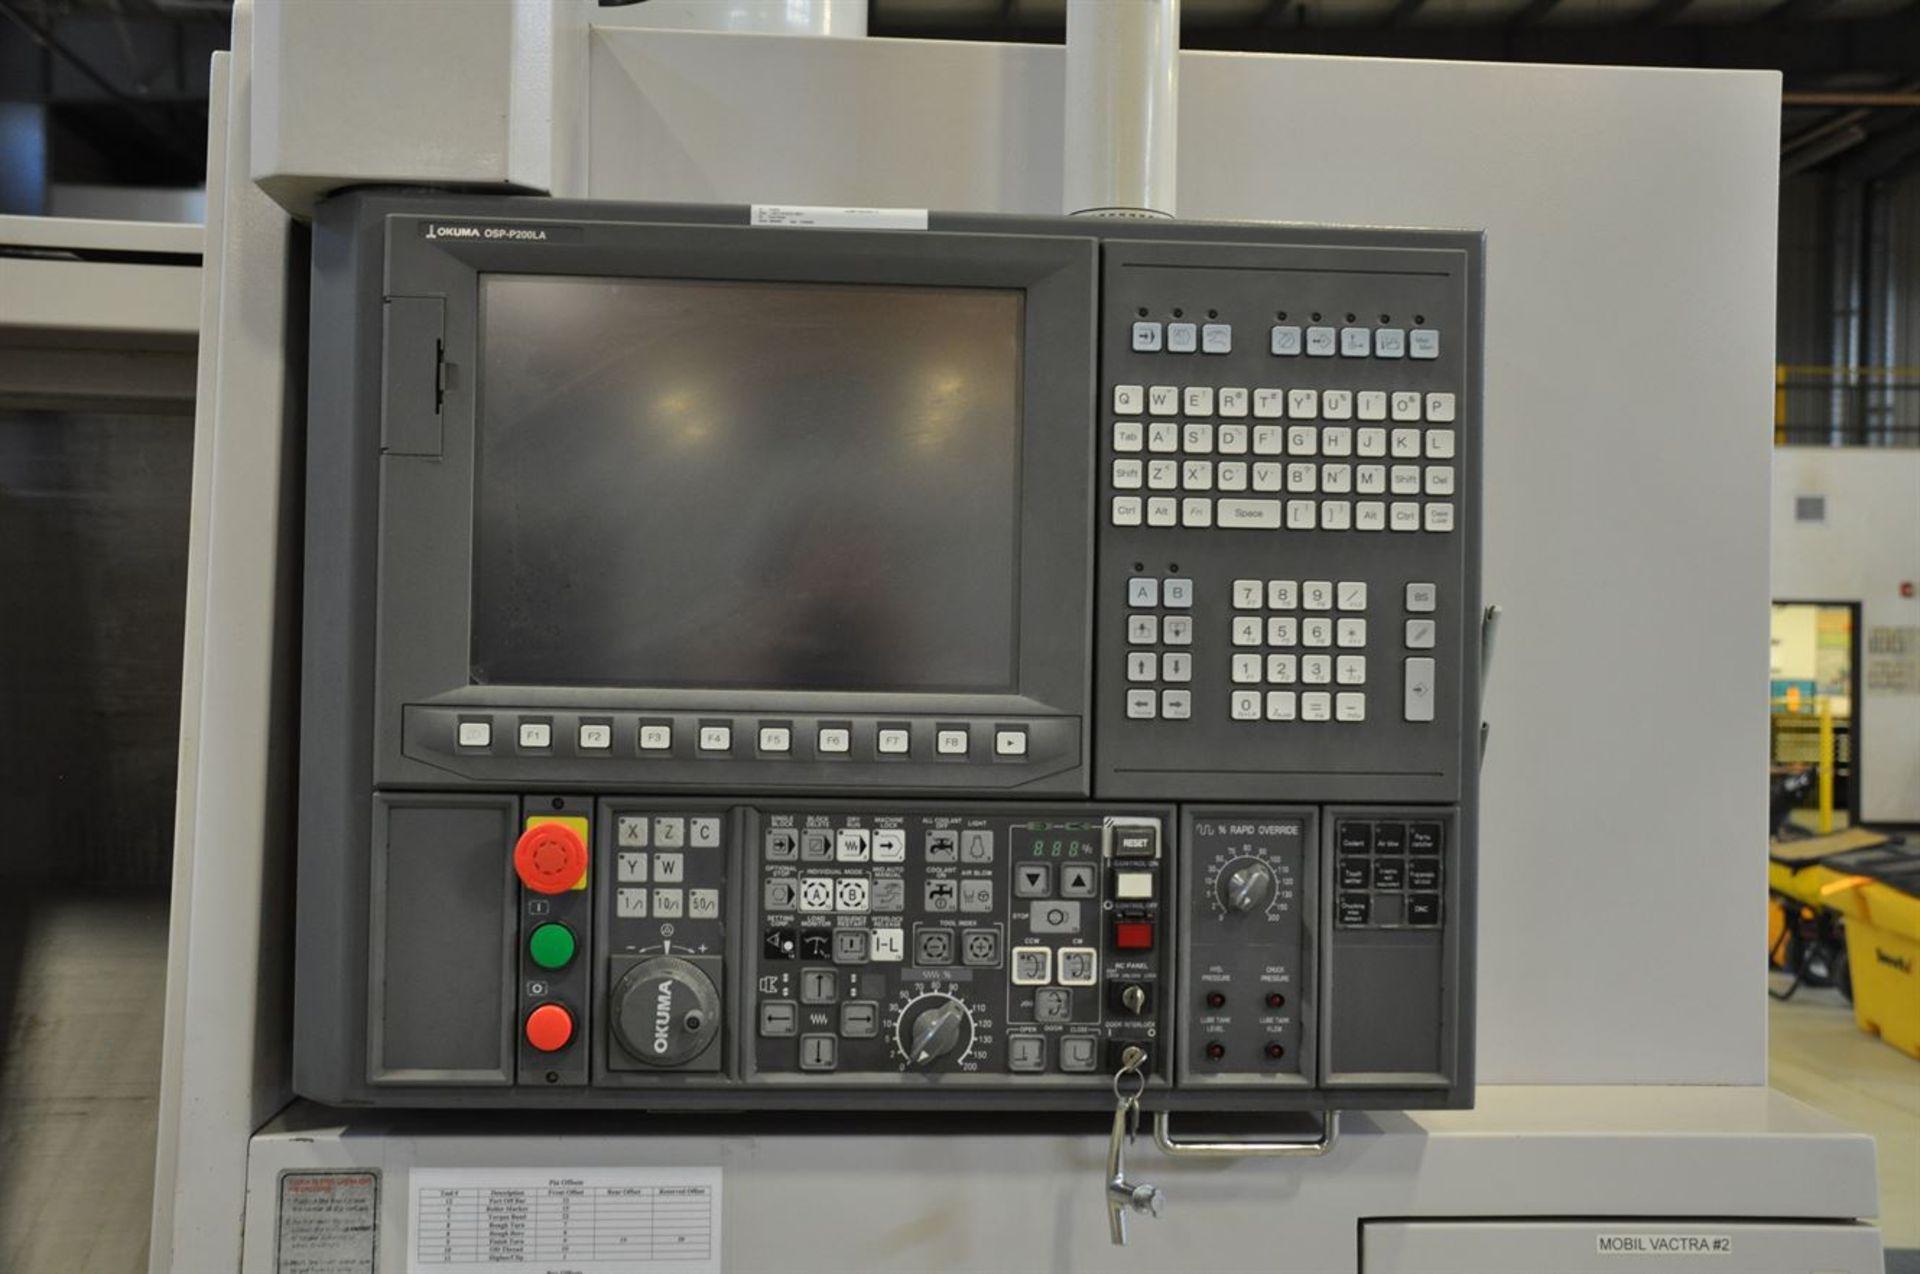 "2012 OKUMA SPACE TURN LB4000 EX CNC Chucker, s/n 161411, w/ OSP-P200LA Control, 3.5"" Bore, SCHUNK - Image 5 of 8"